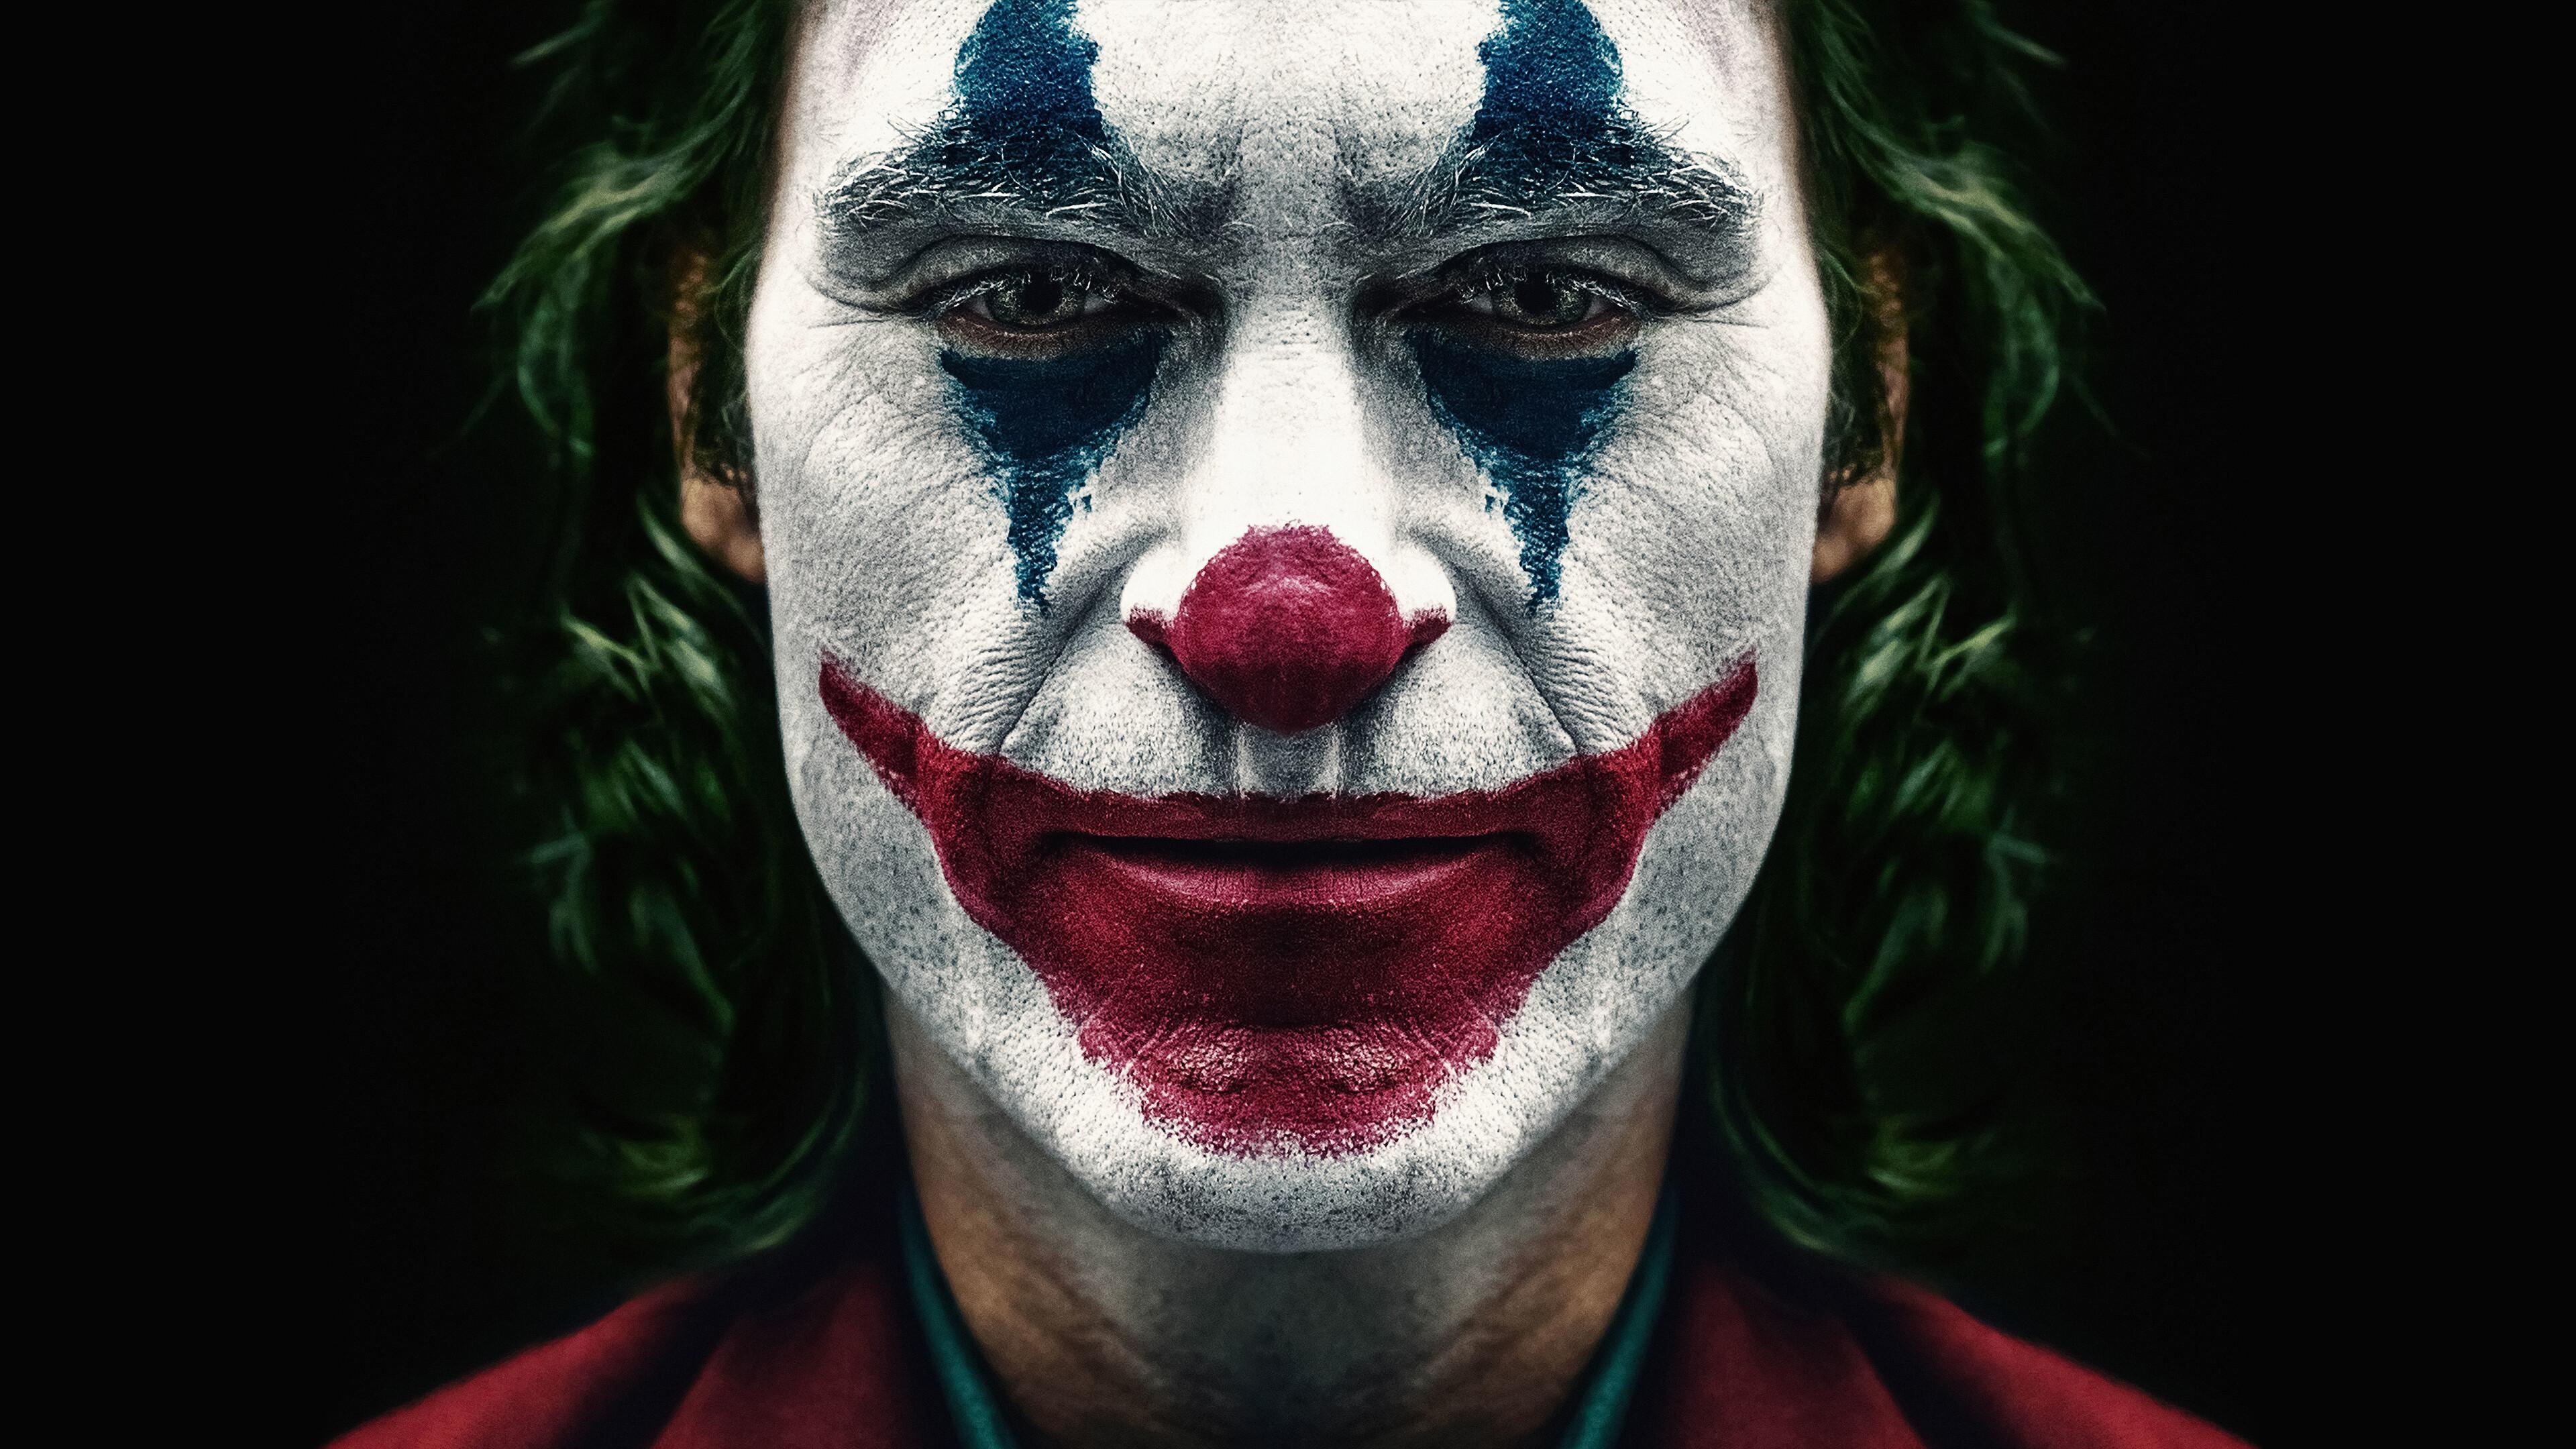 joker 2019 joaquin phoenix clown 1569187506 - Joker 2019 Joaquin Phoenix Clown - movies wallpapers, joker wallpapers, joker movie wallpapers, joaquin phoenix wallpapers, hd-wallpapers, 4k-wallpapers, 2019 movies wallpapers